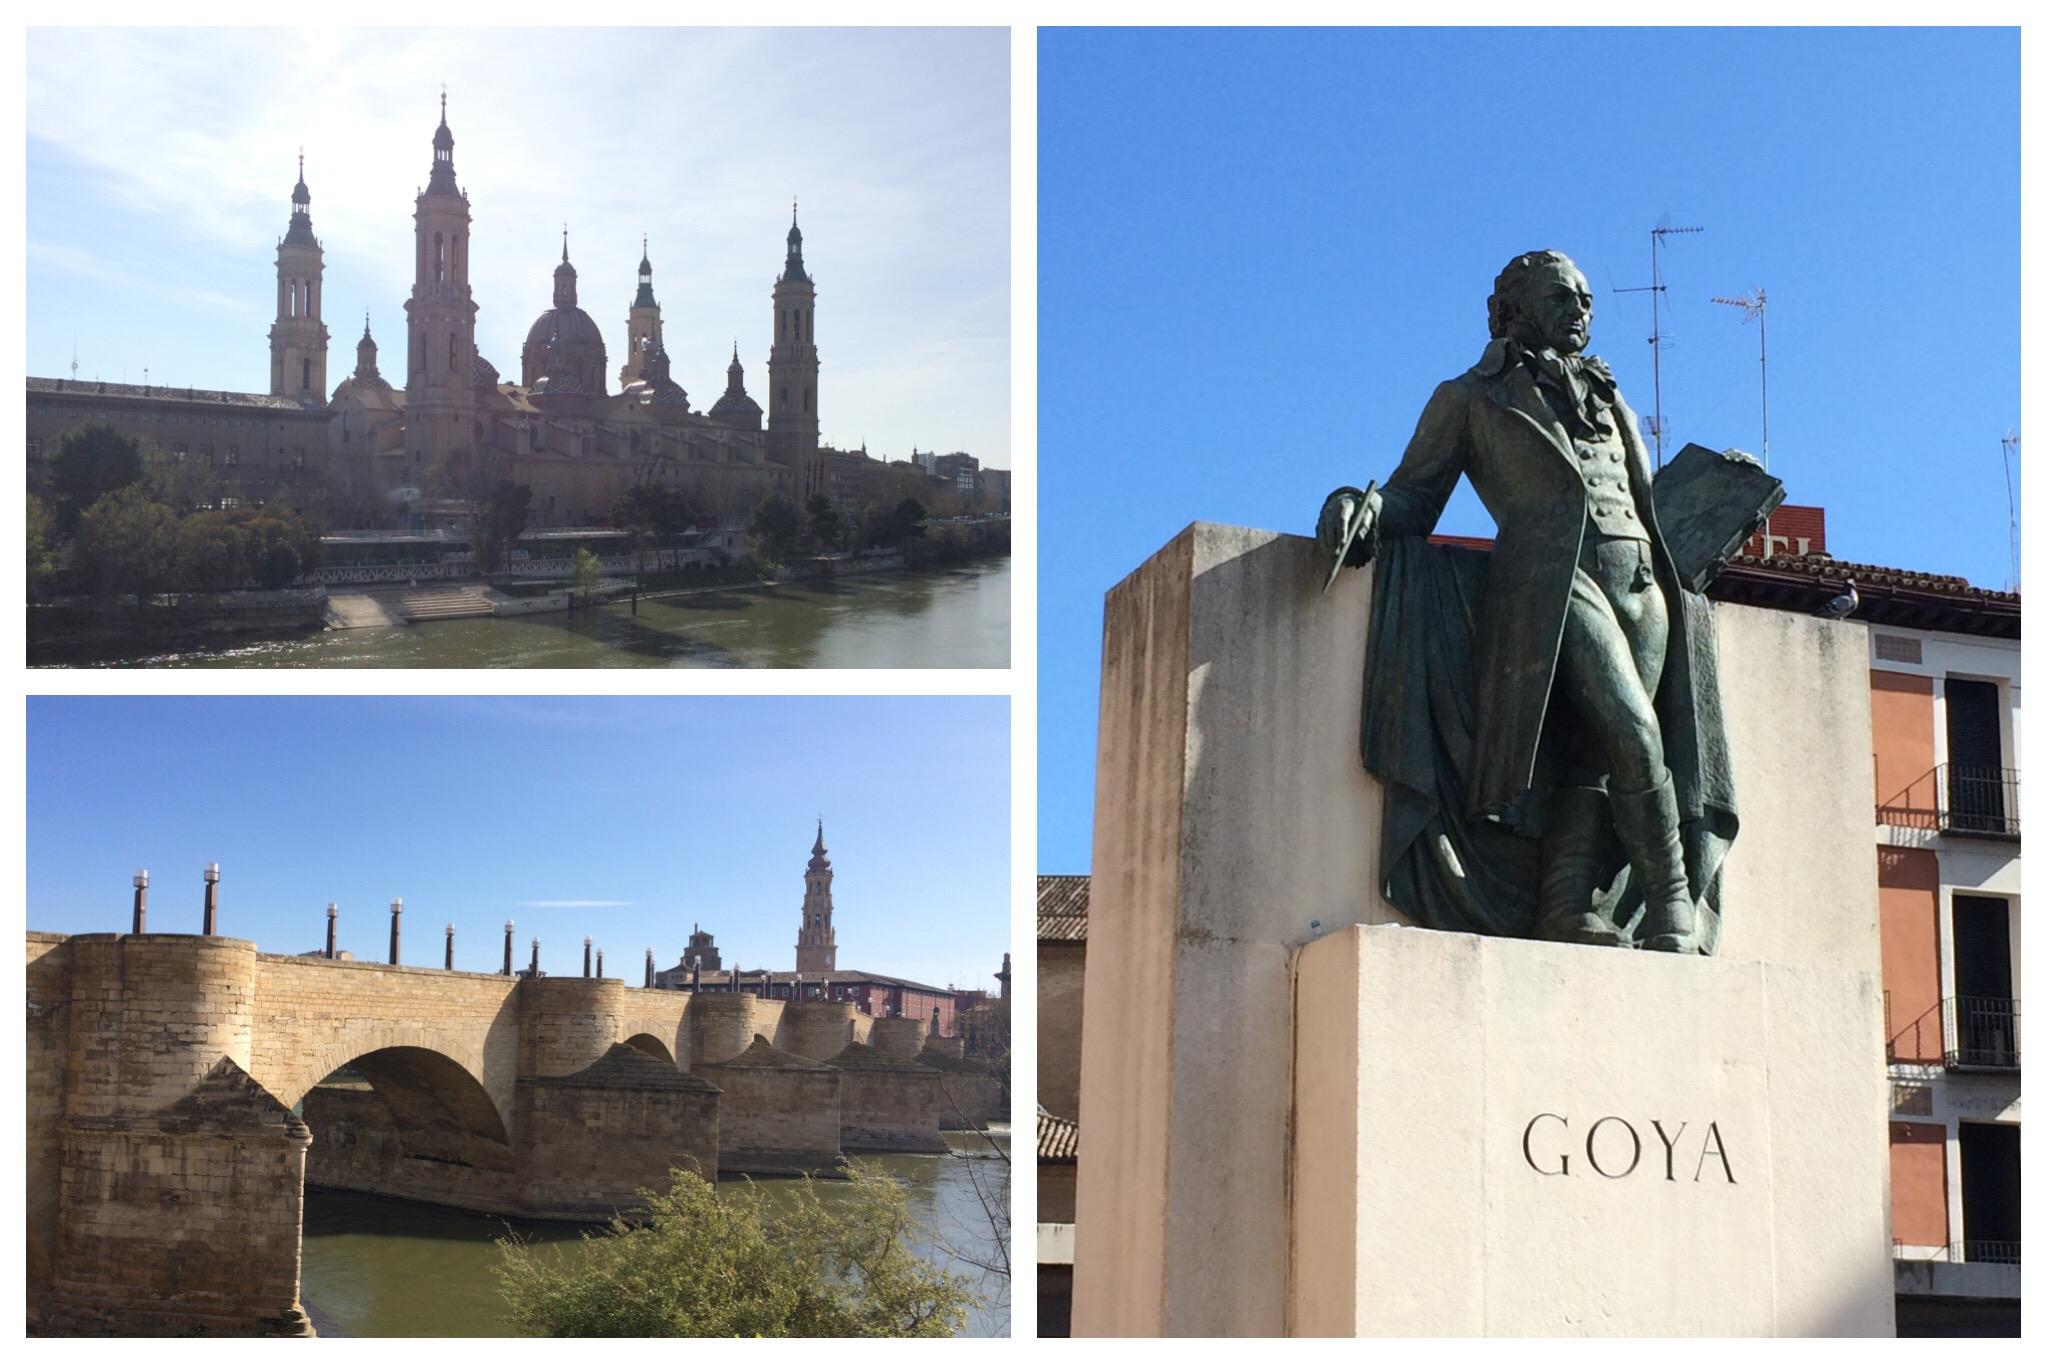 Zaragoza cathedral Roman bridge Goya statue